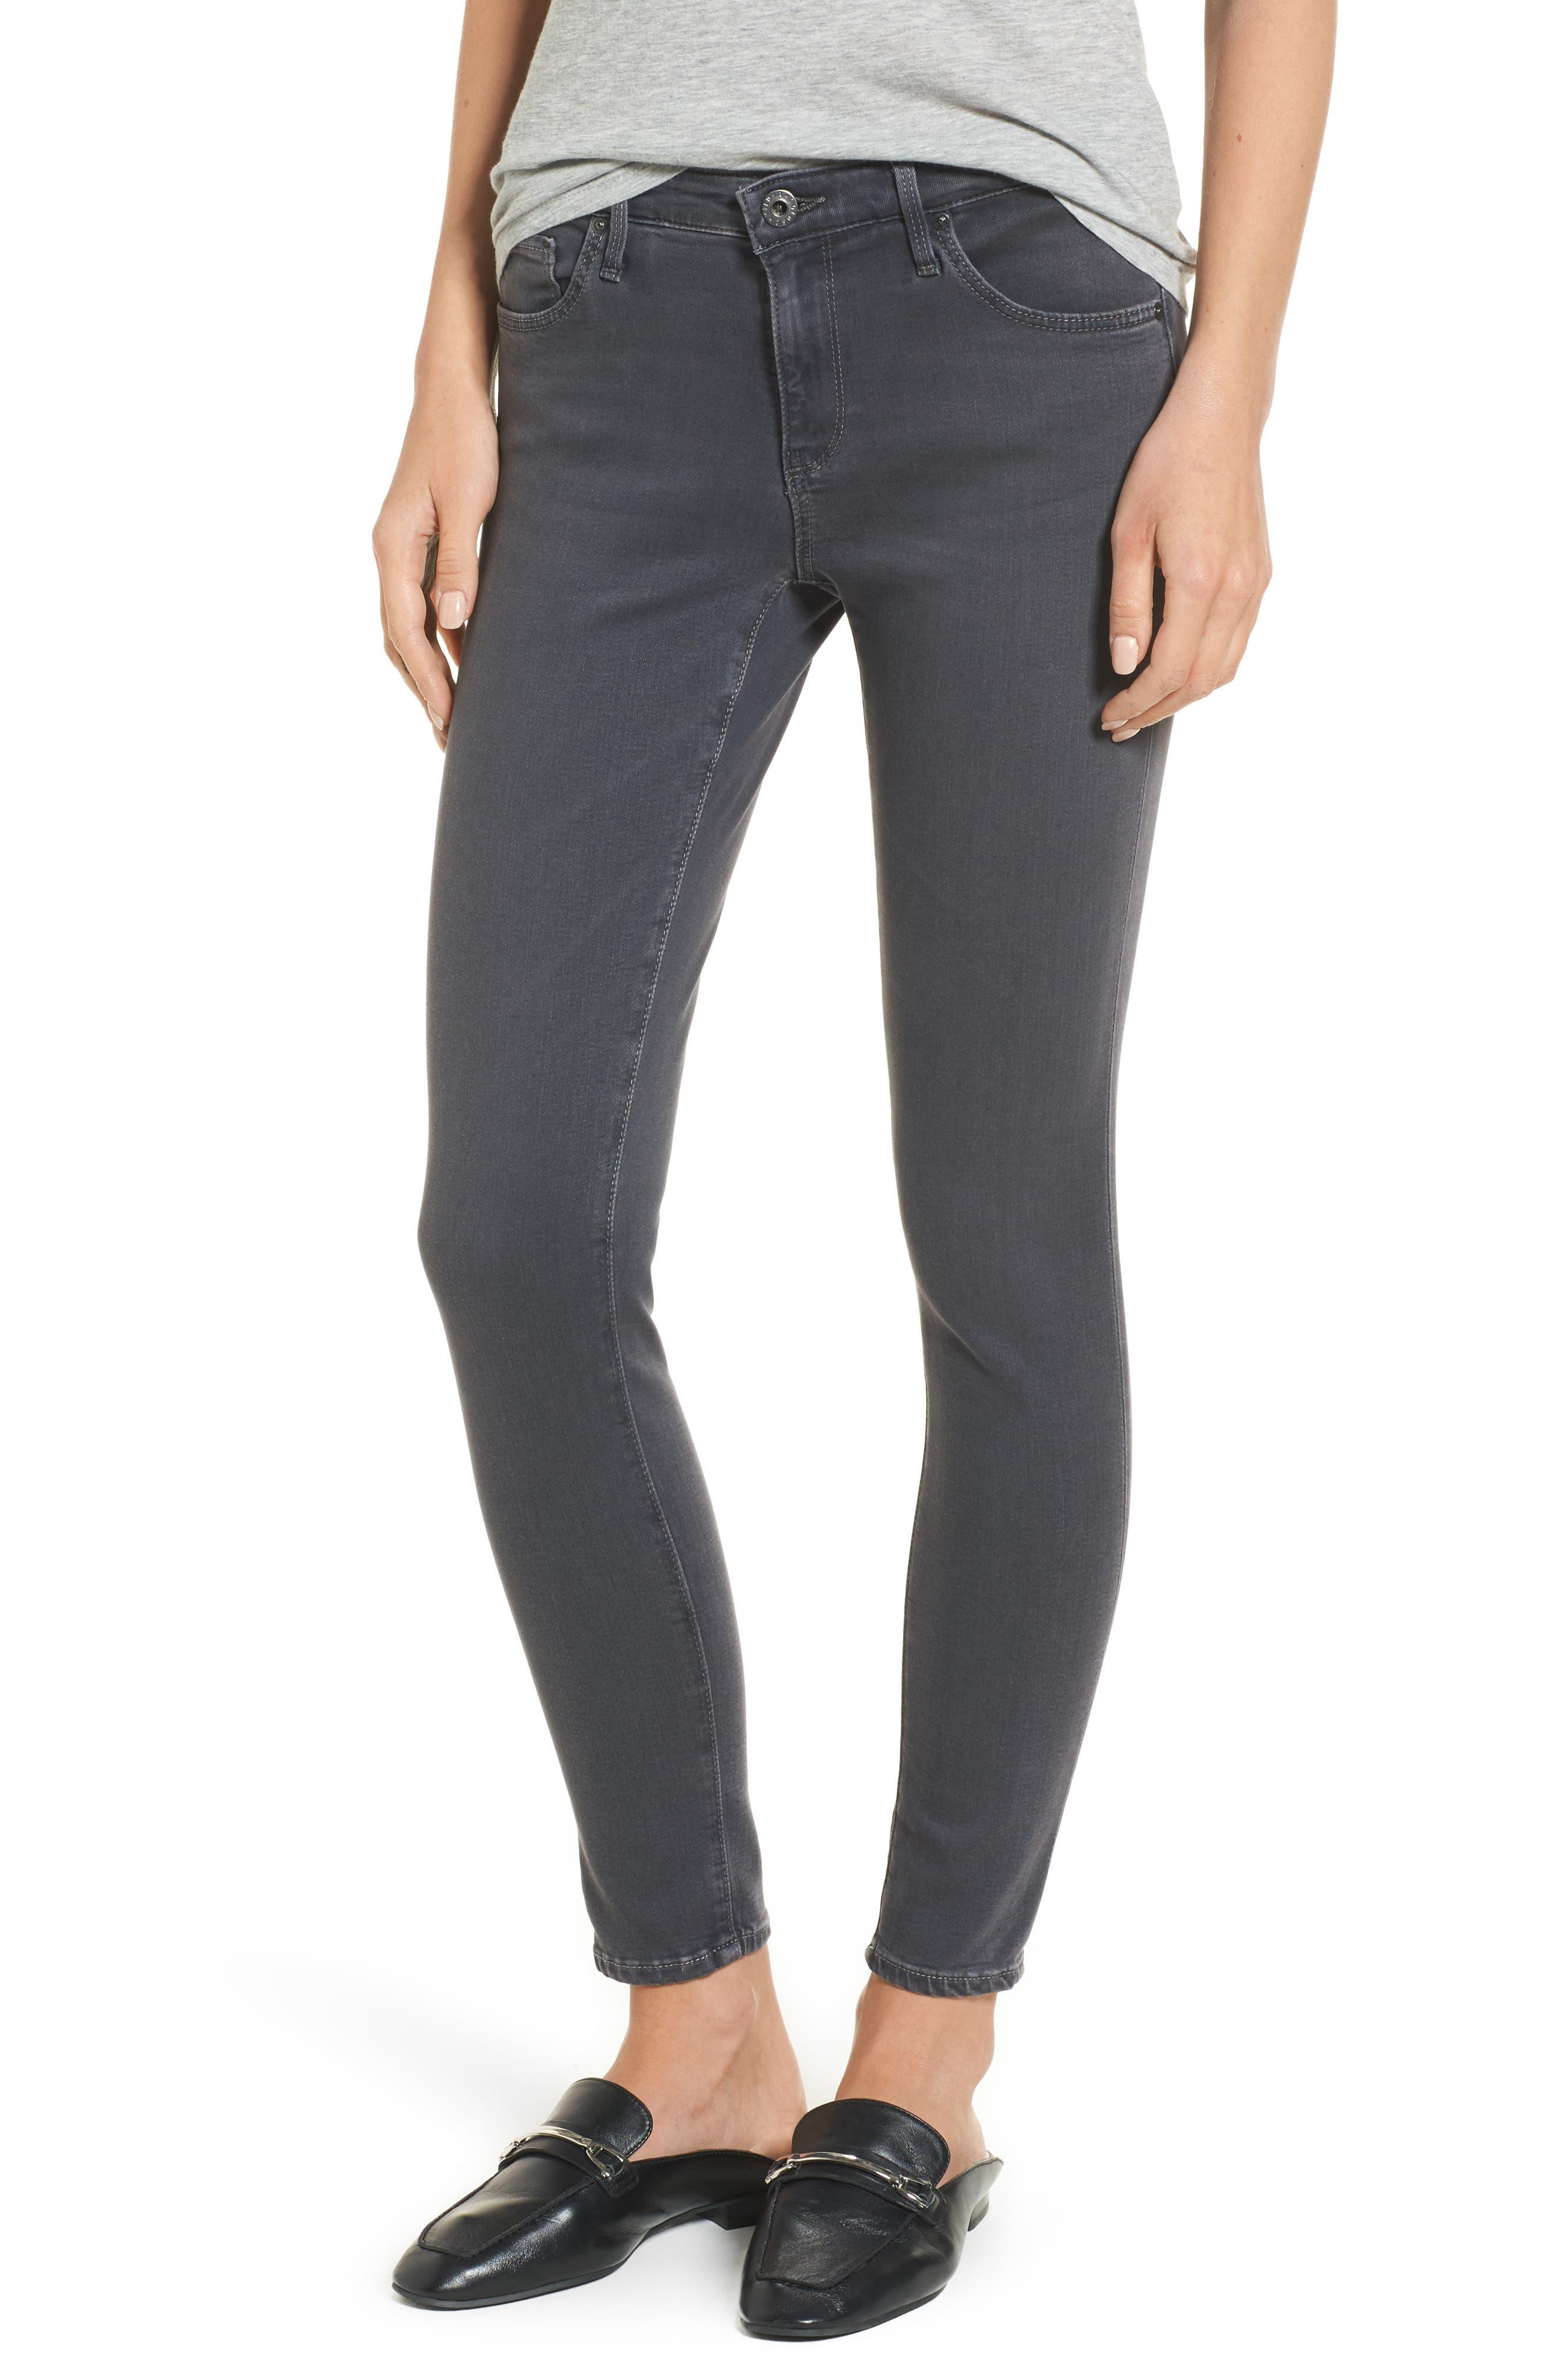 Ankle 'The Legging' Super Skinny Jeans,                         Main,                         color, Raven Plume